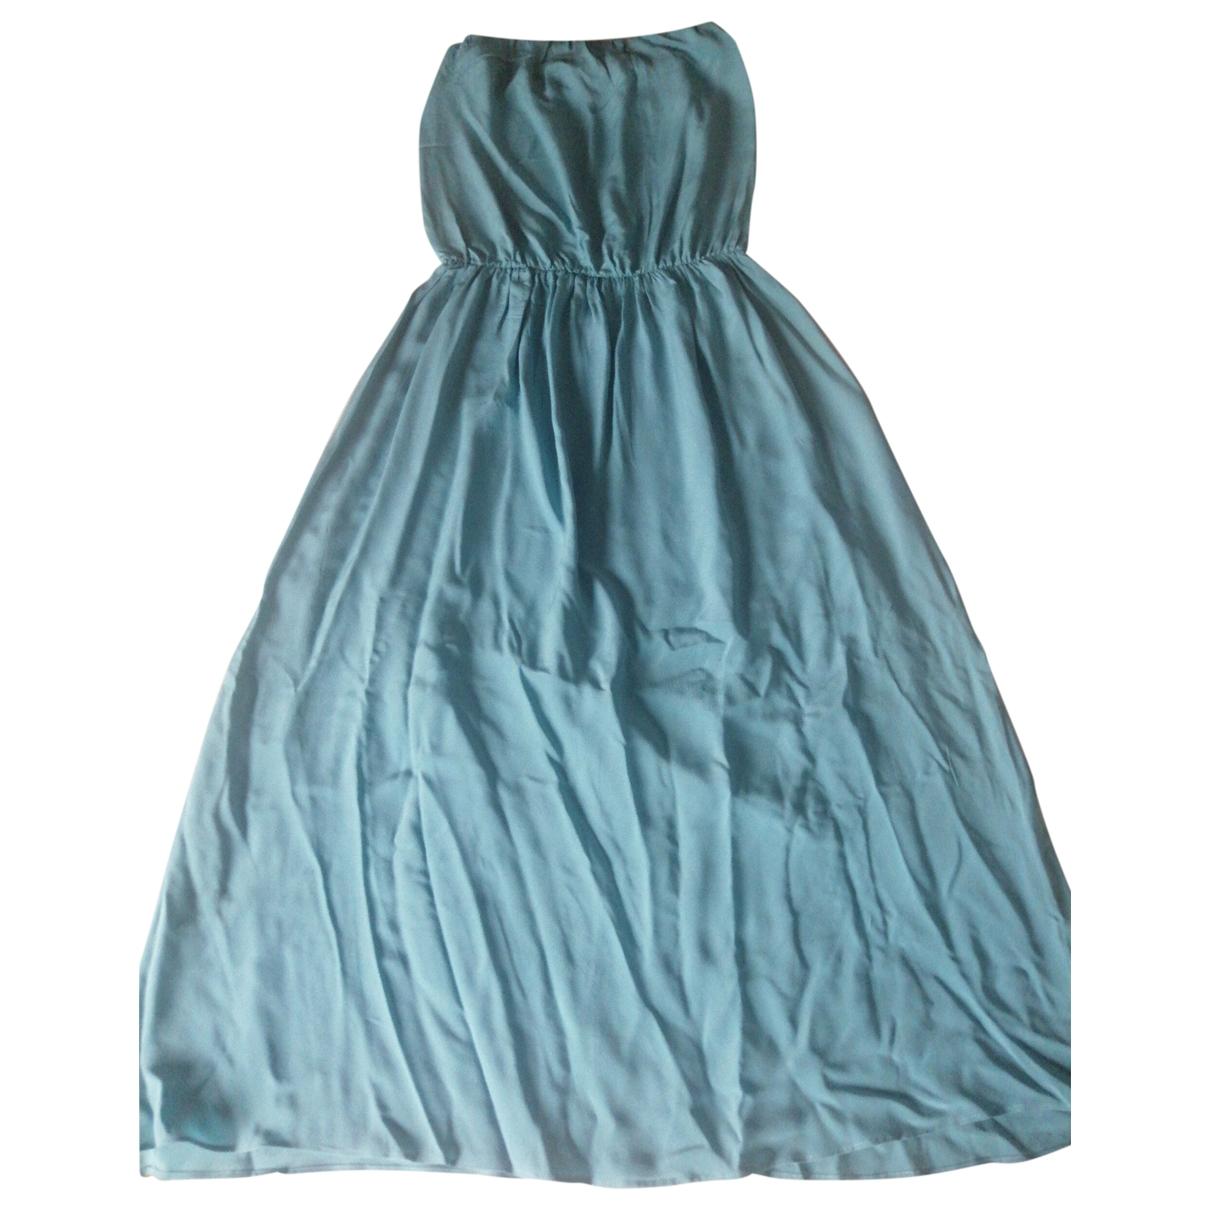 Erika Cavallini \N Turquoise Silk dress for Women 42 IT